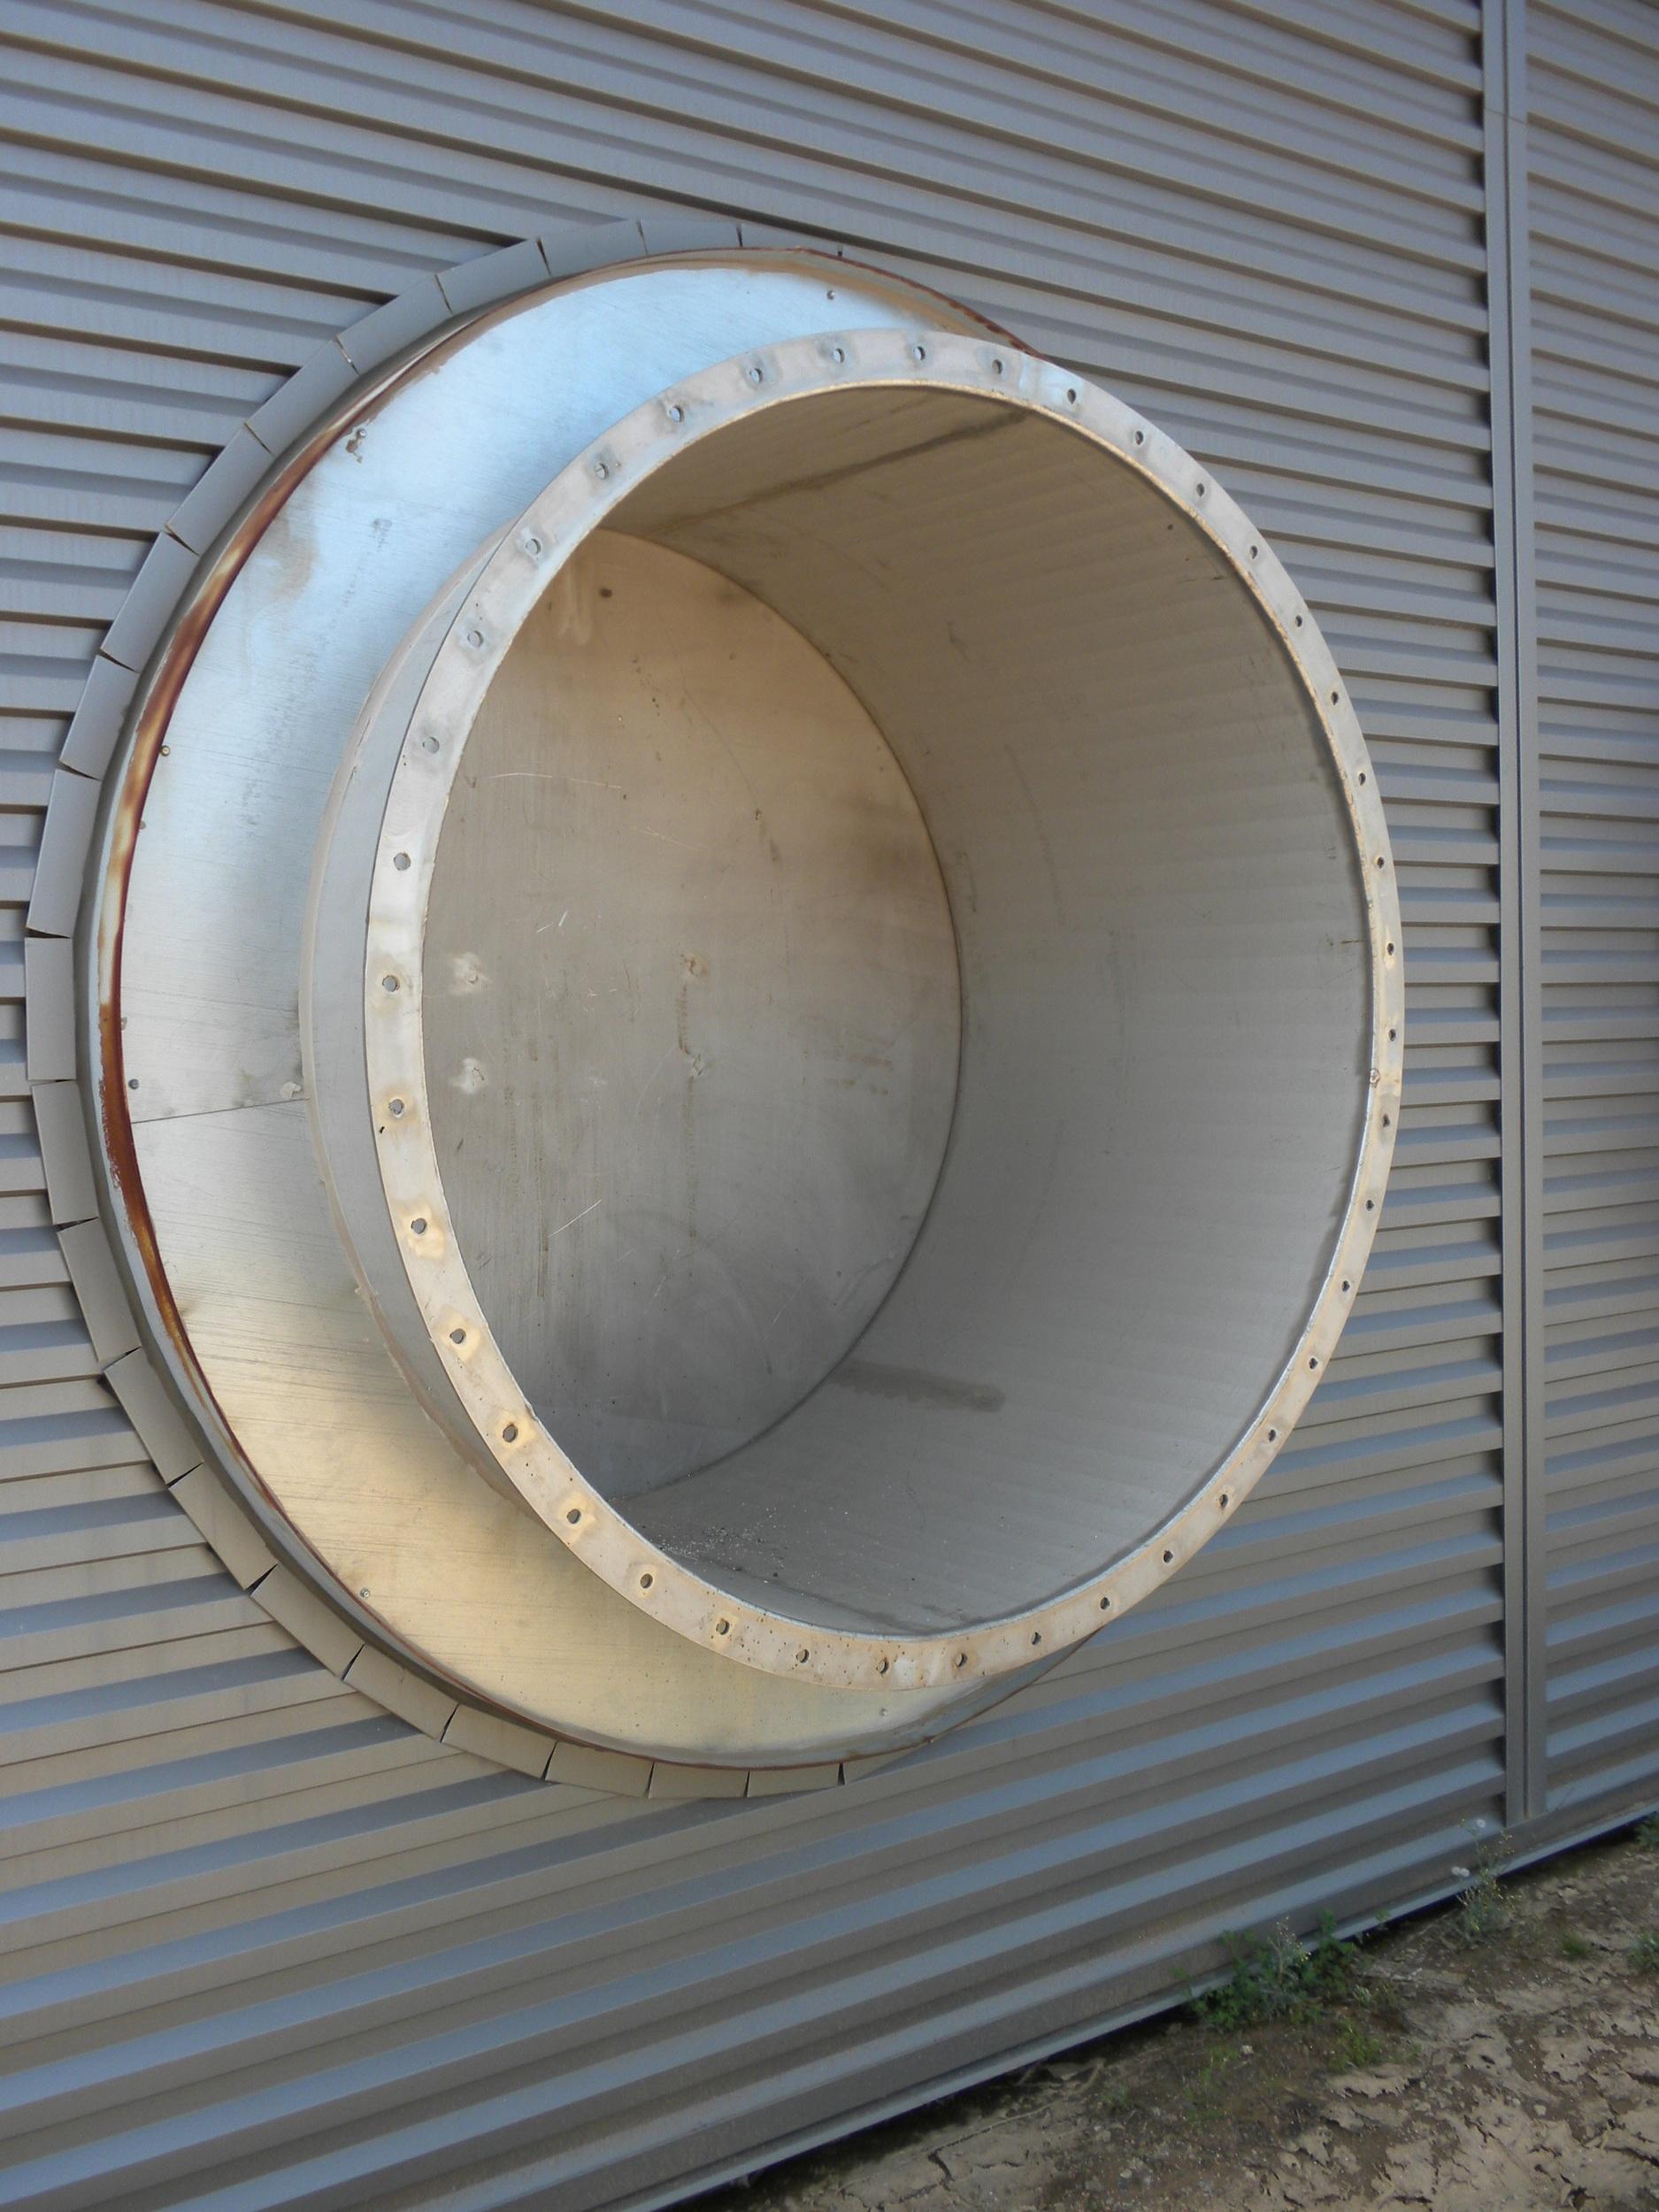 GA Tech - AeroSpace Combustion Flare Location 07.JPG